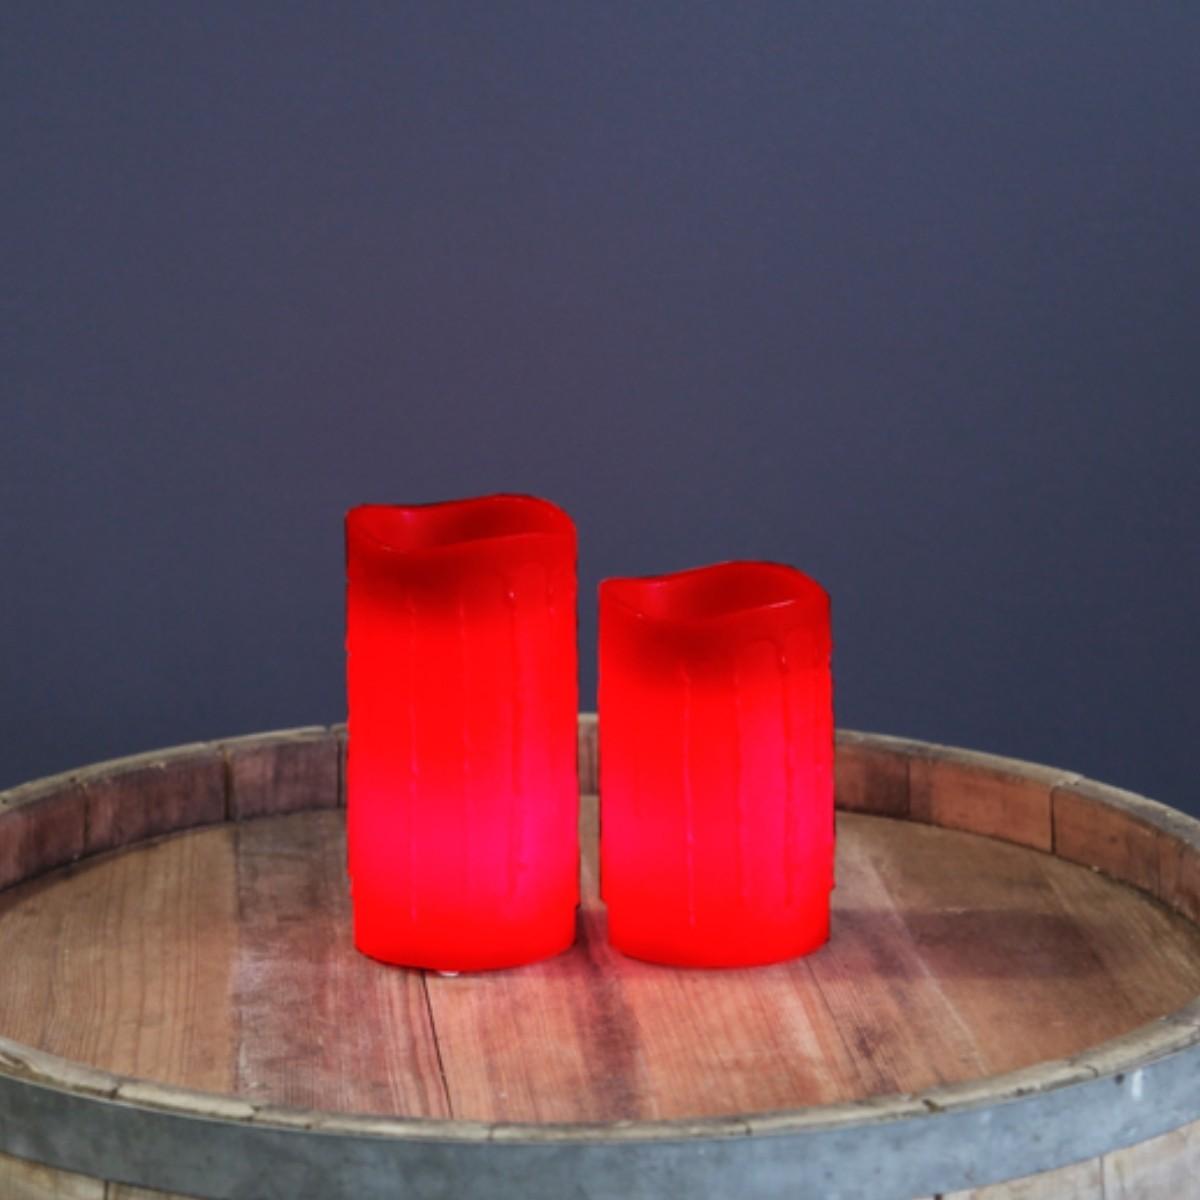 LED Kerze Drip - Echtwachs - flackernde LED - Timer - H: 15cm - rot